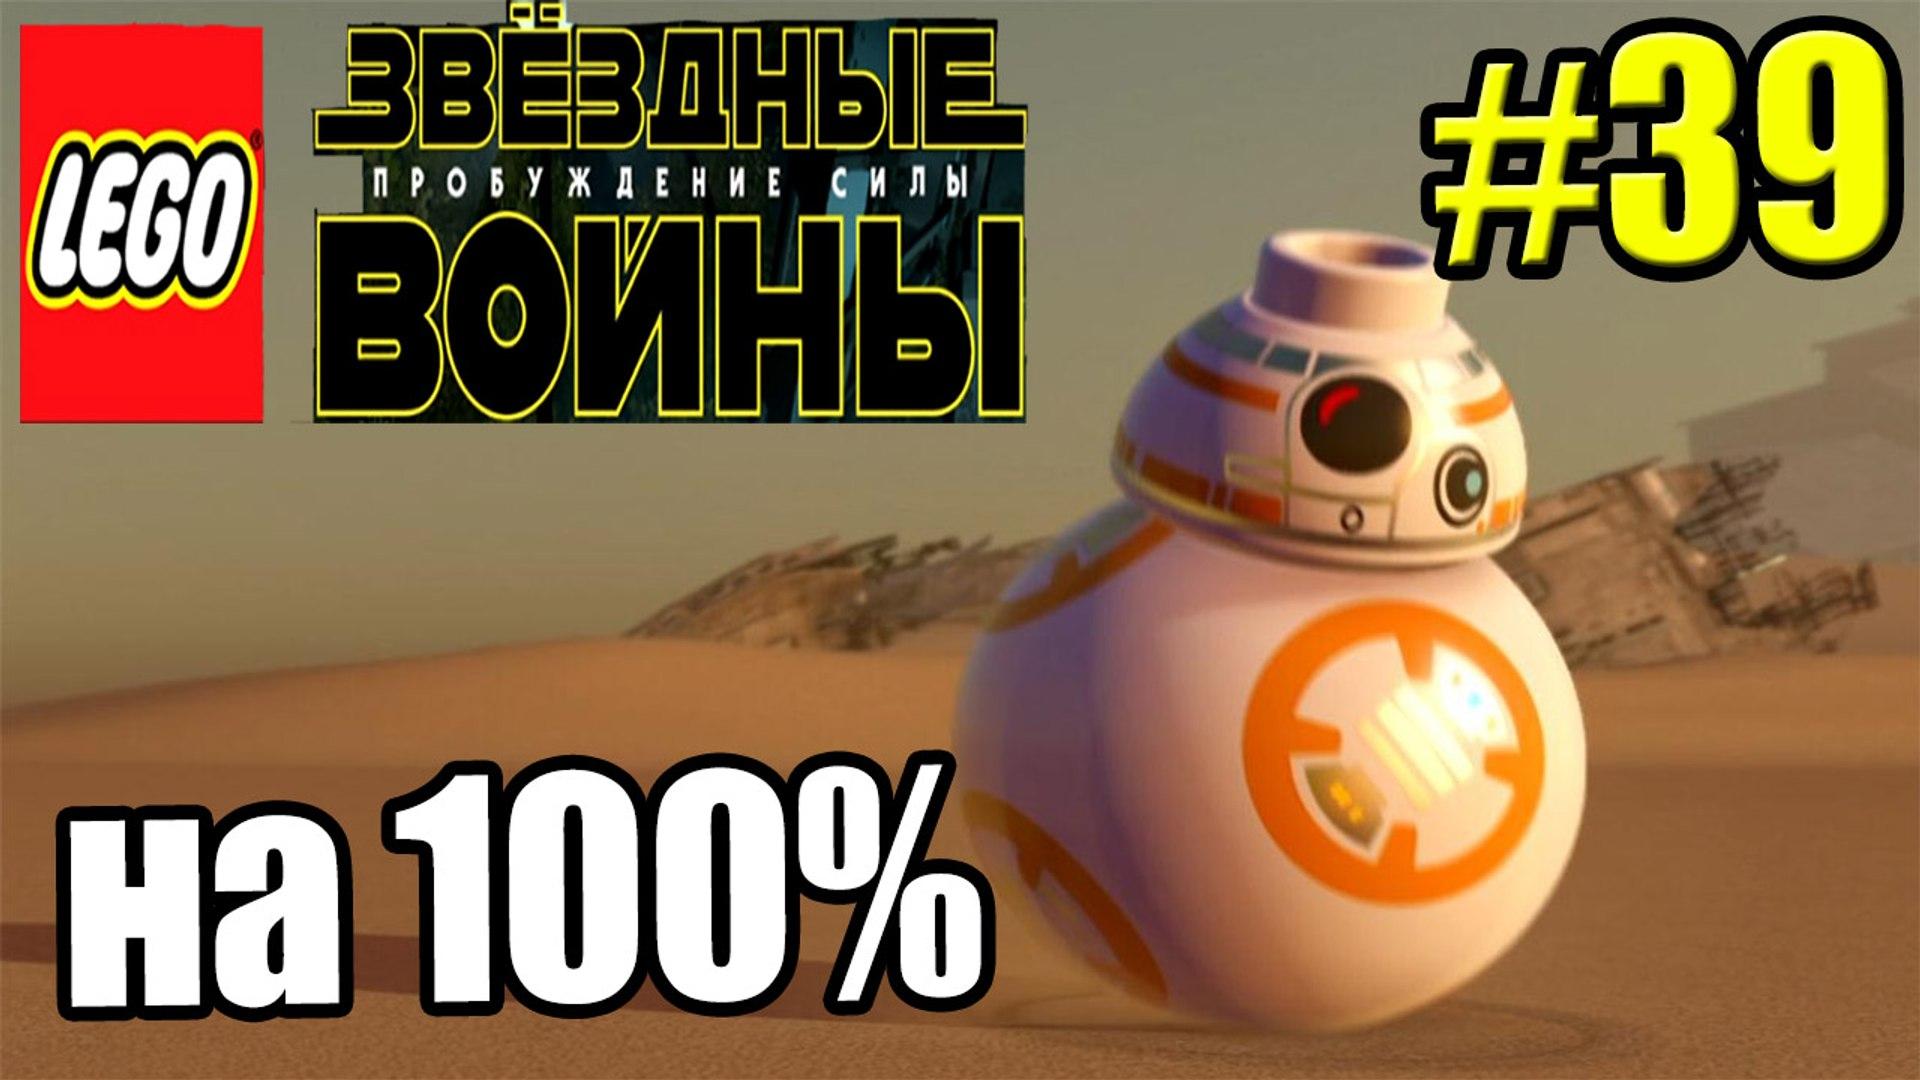 LEGO STAR WARS The Force Awakens {PC} прохождение часть 39 — Глава 2 Побег с Разрушителя на 100%